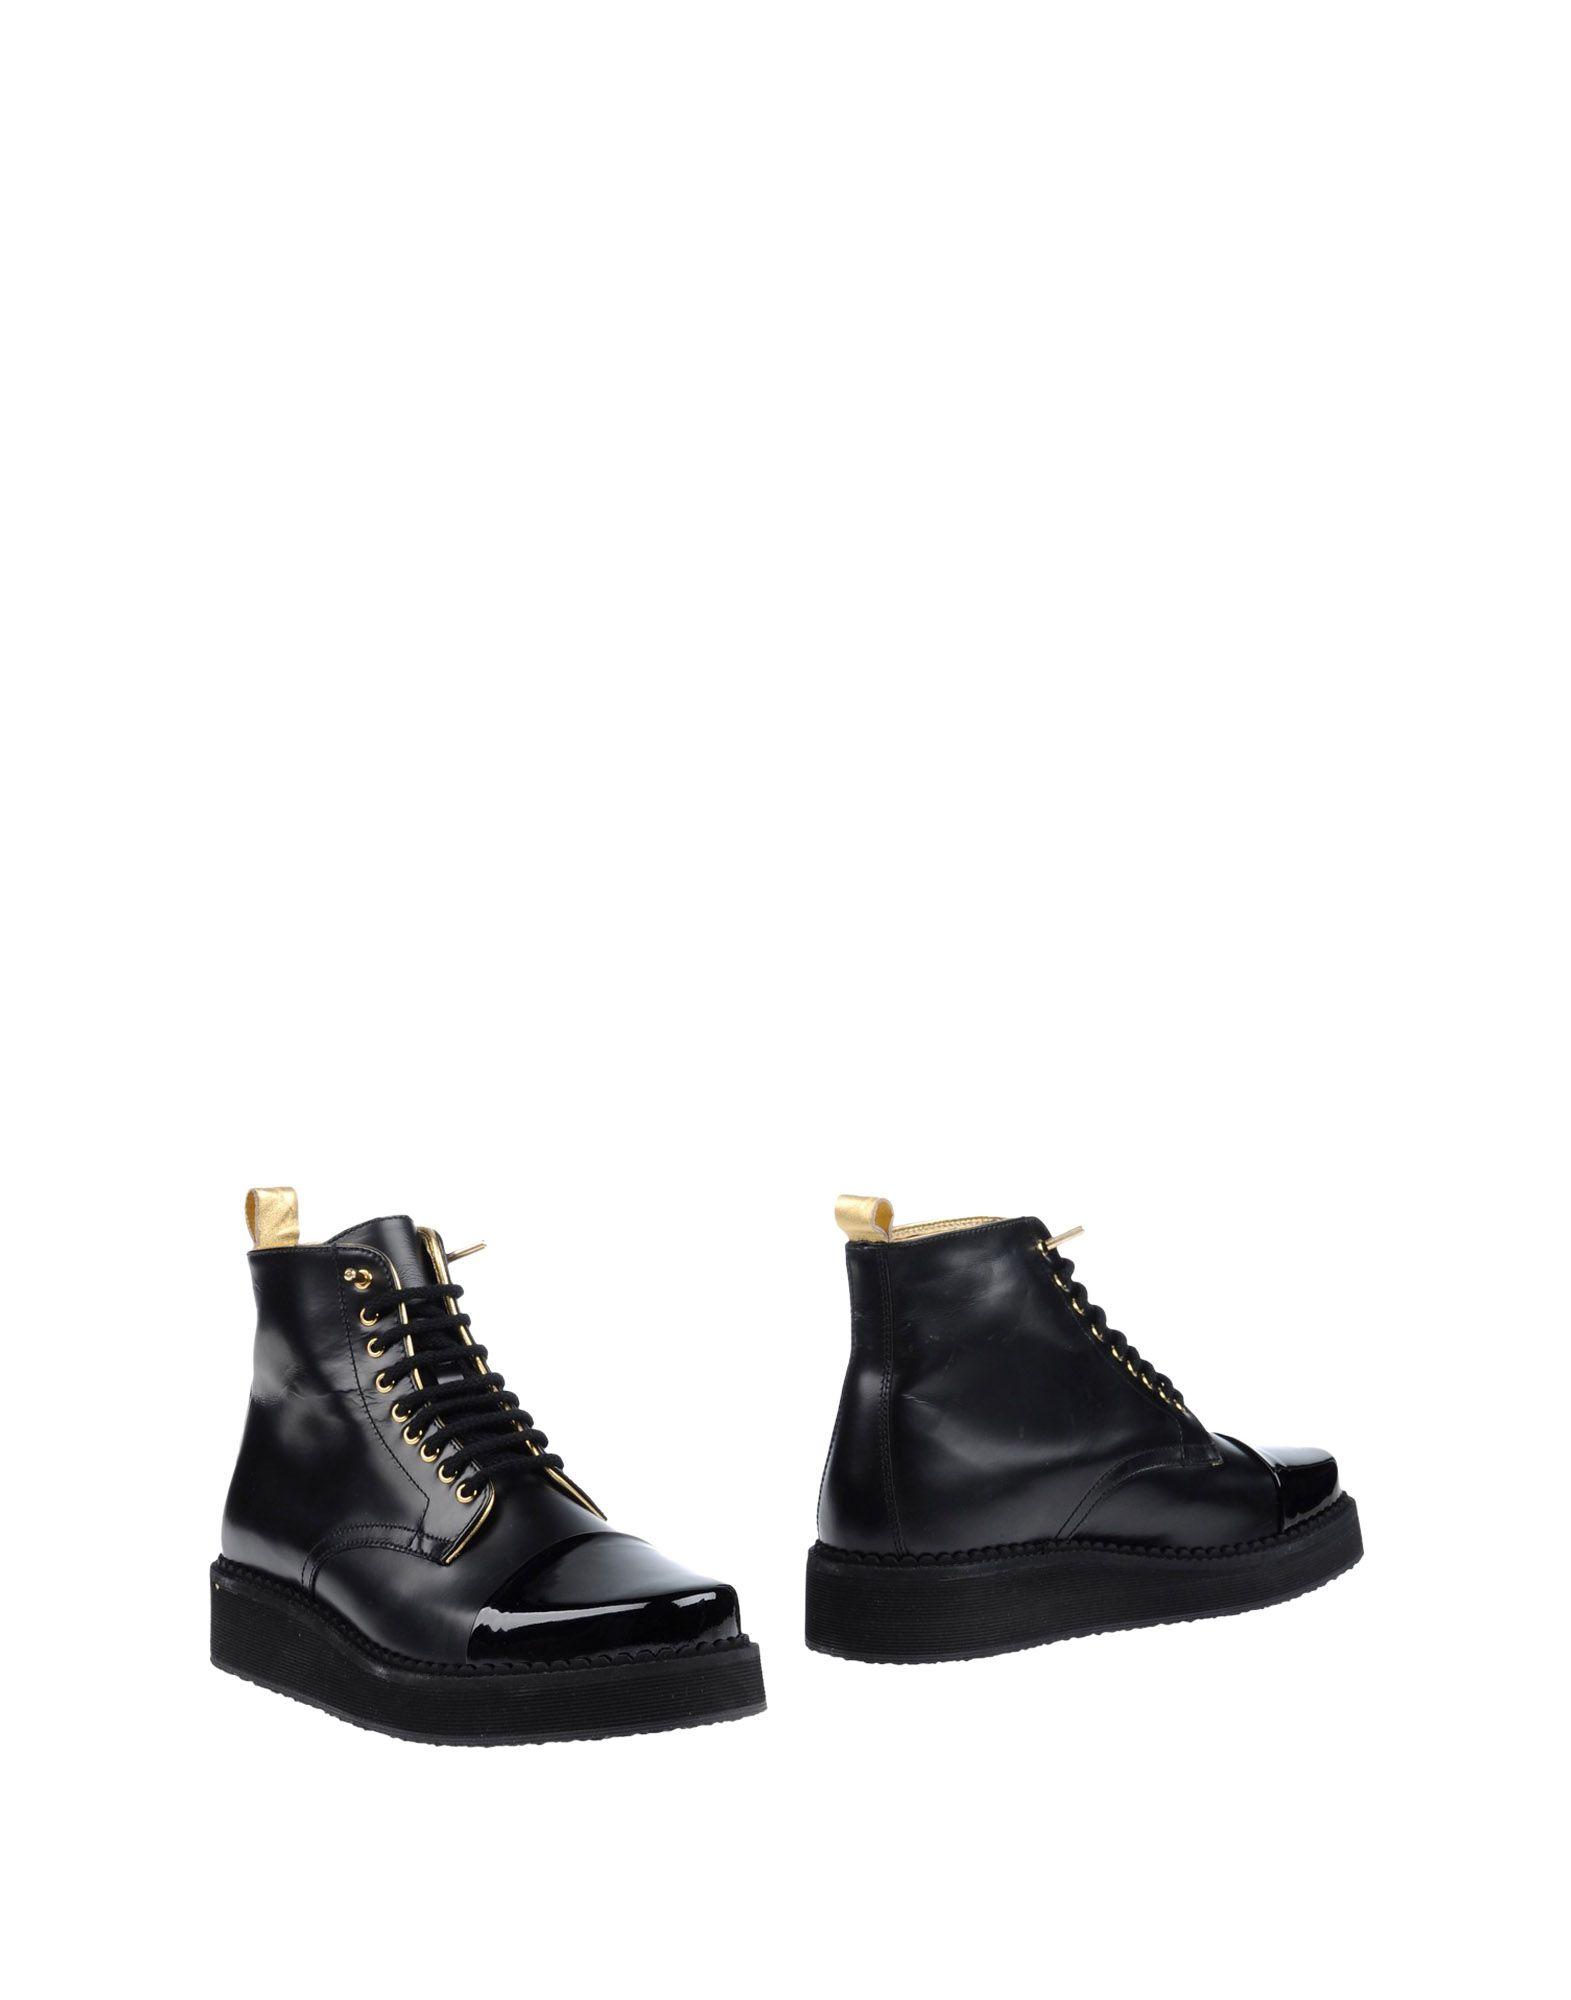 Le Qarant Boots - Men Le Qarant Boots online on on on  Australia - 11250441UR 3e7f66